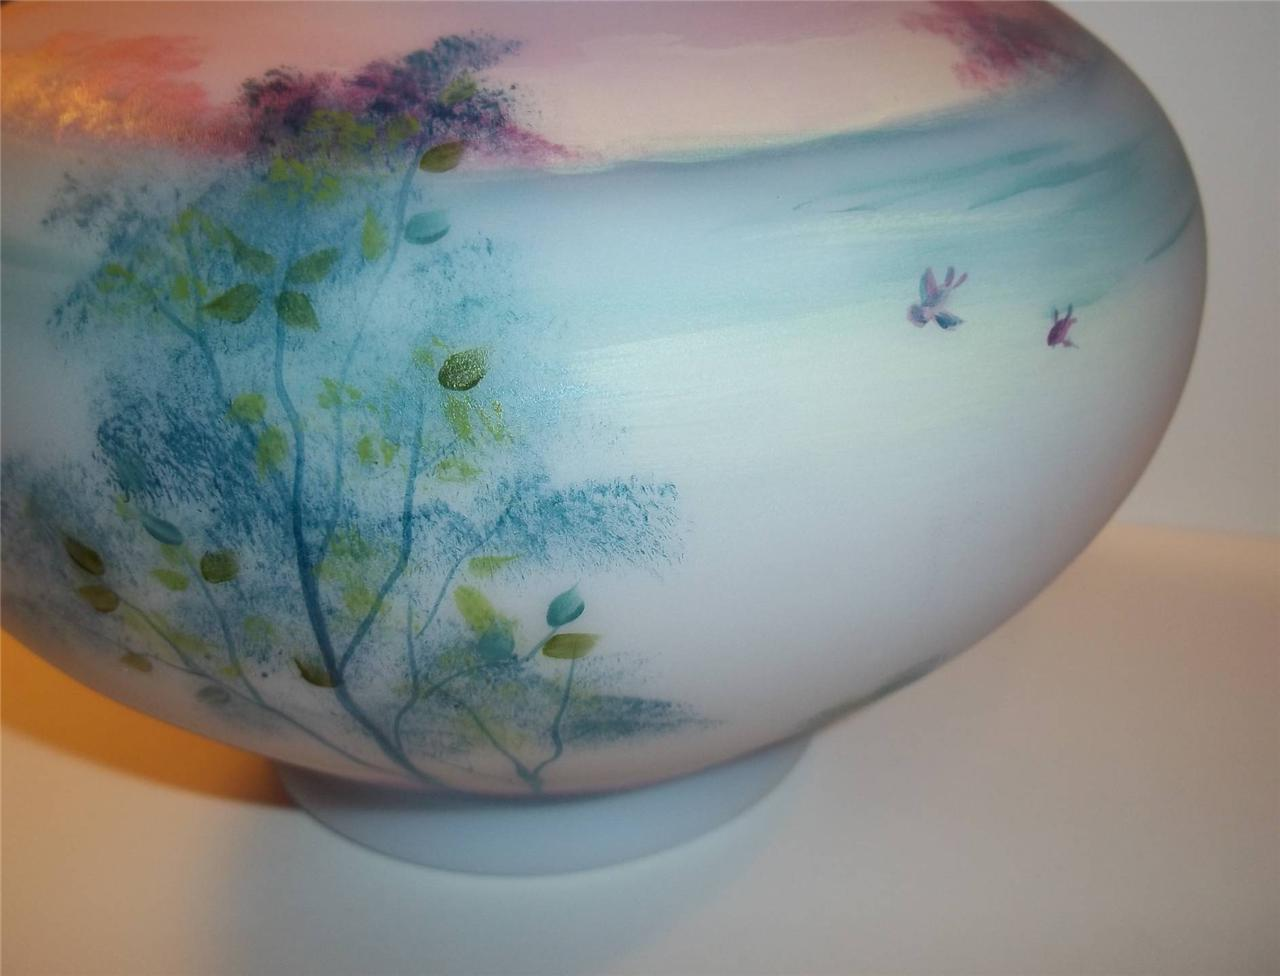 Fenton Glass BLUE BURMESE Misty Morn Tree Scene Vase Limited Ed #2/15 Kim Barley